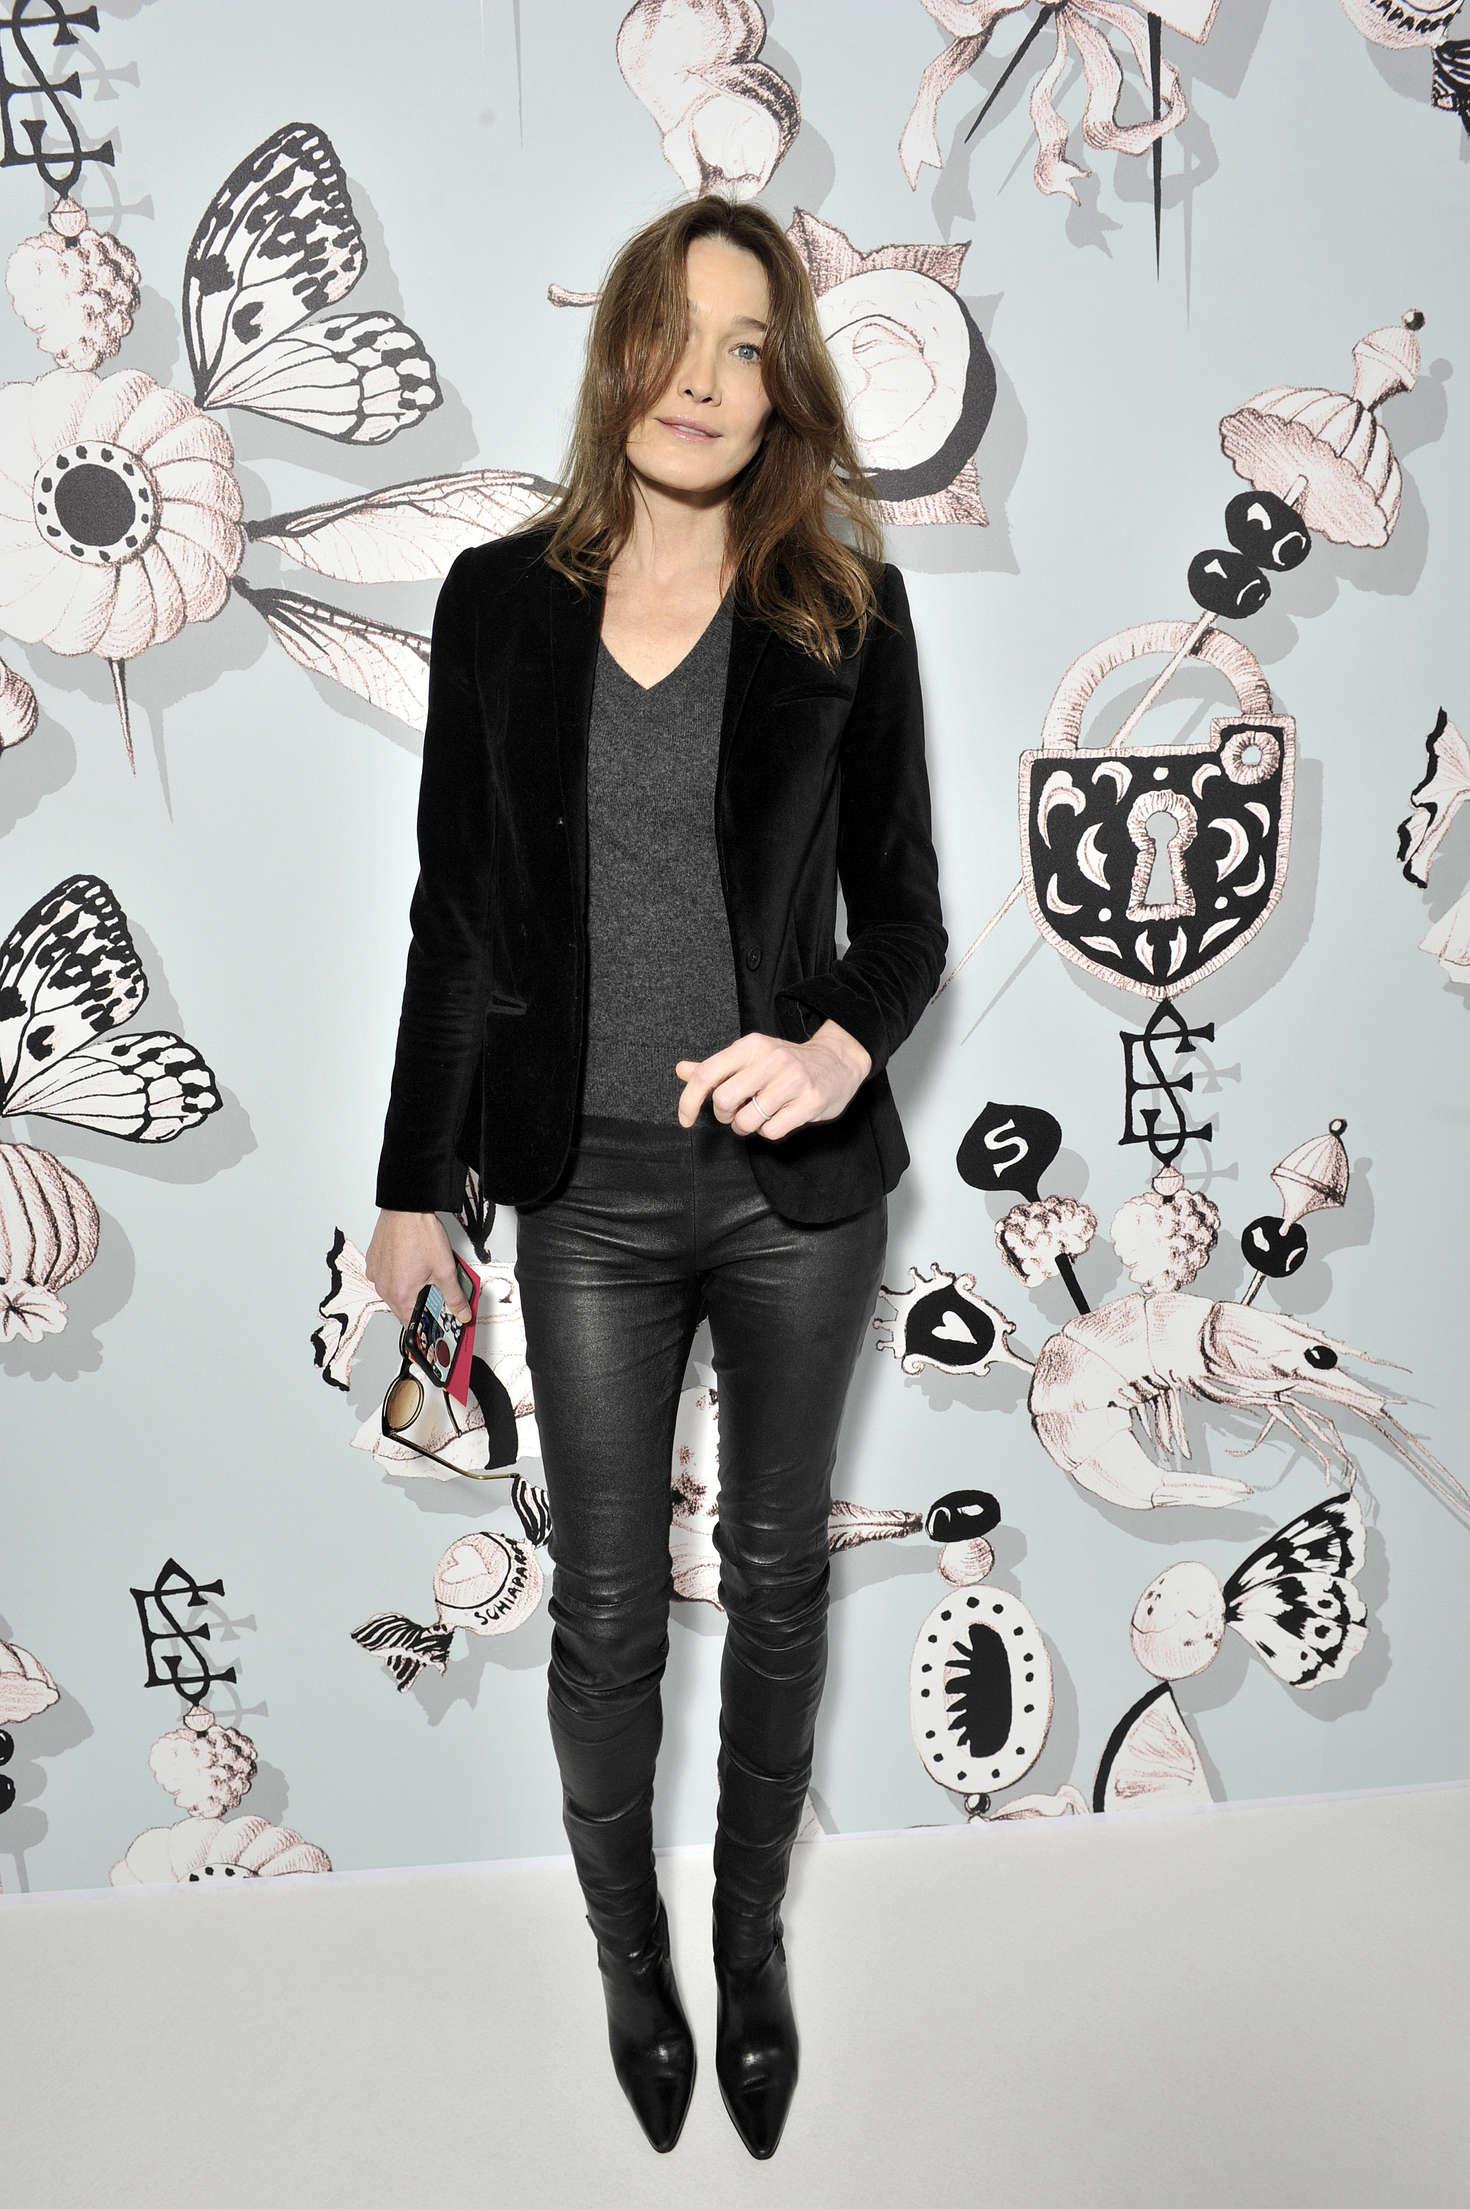 Carla Bruni attends People at Haute Couture Fashion Show Schiaparelli